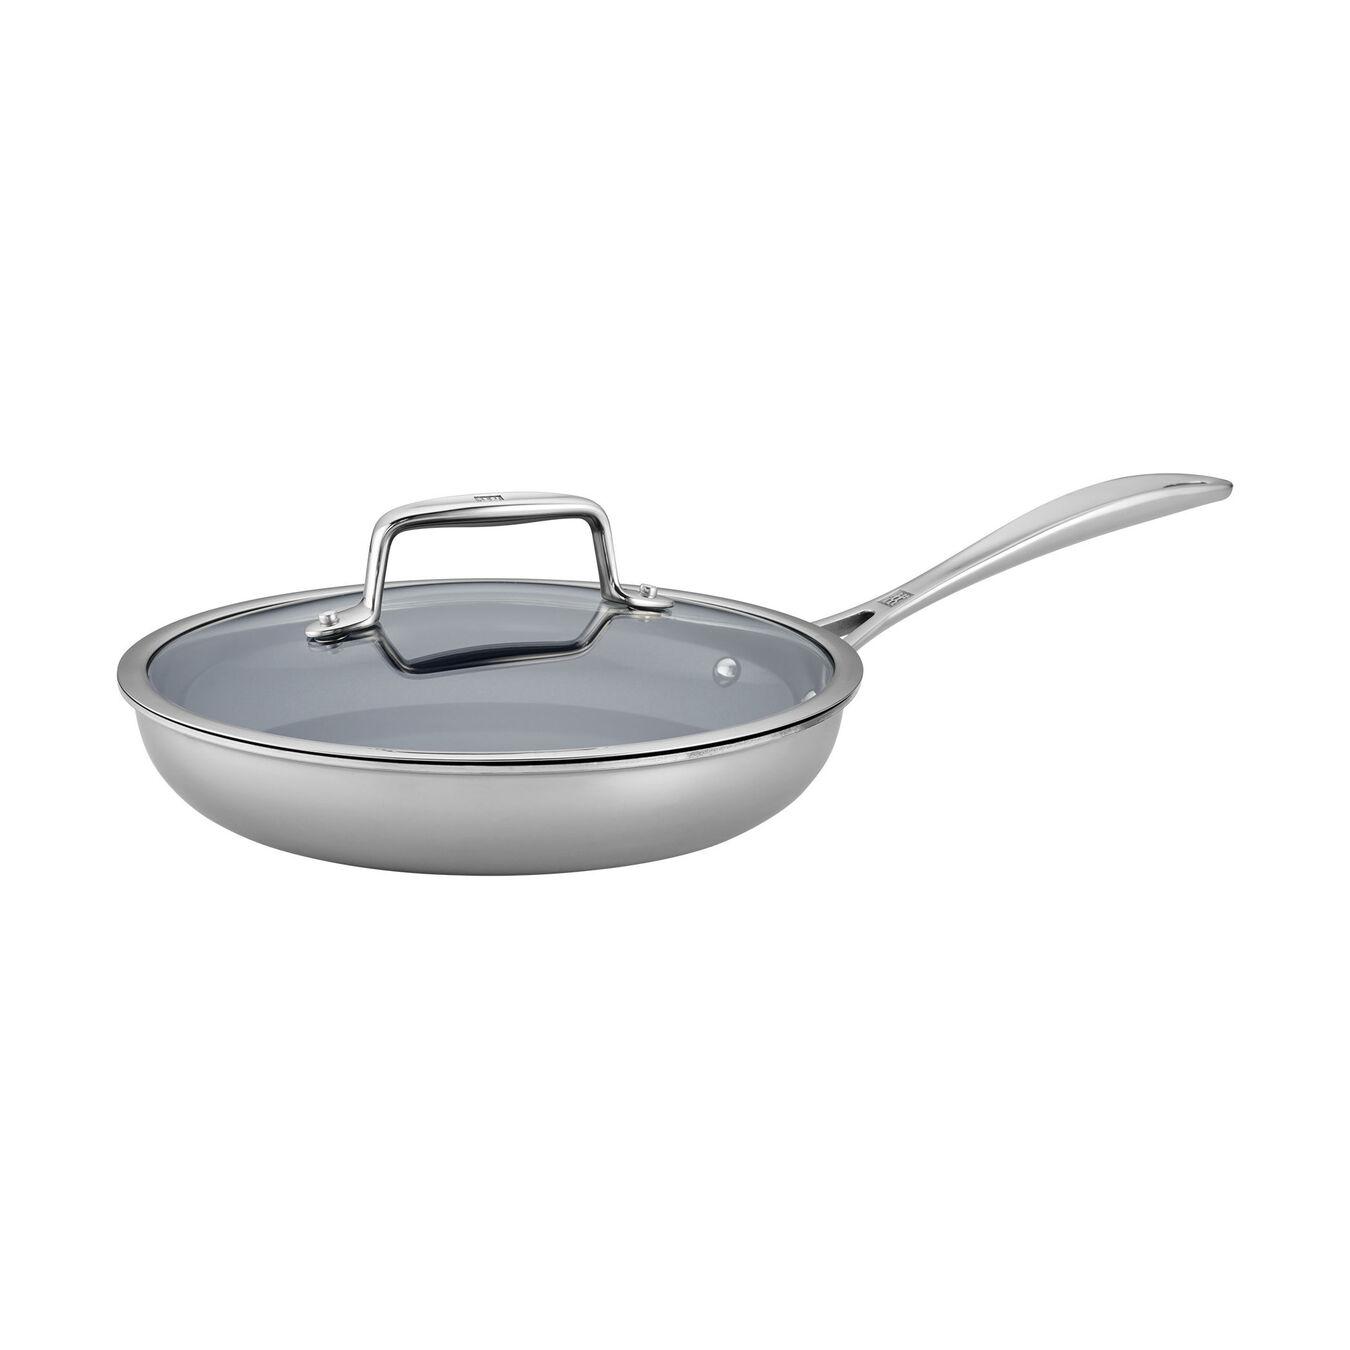 2-pc, 18/10 Stainless Steel, Ceramic, Non-stick, Frying pan set,,large 1